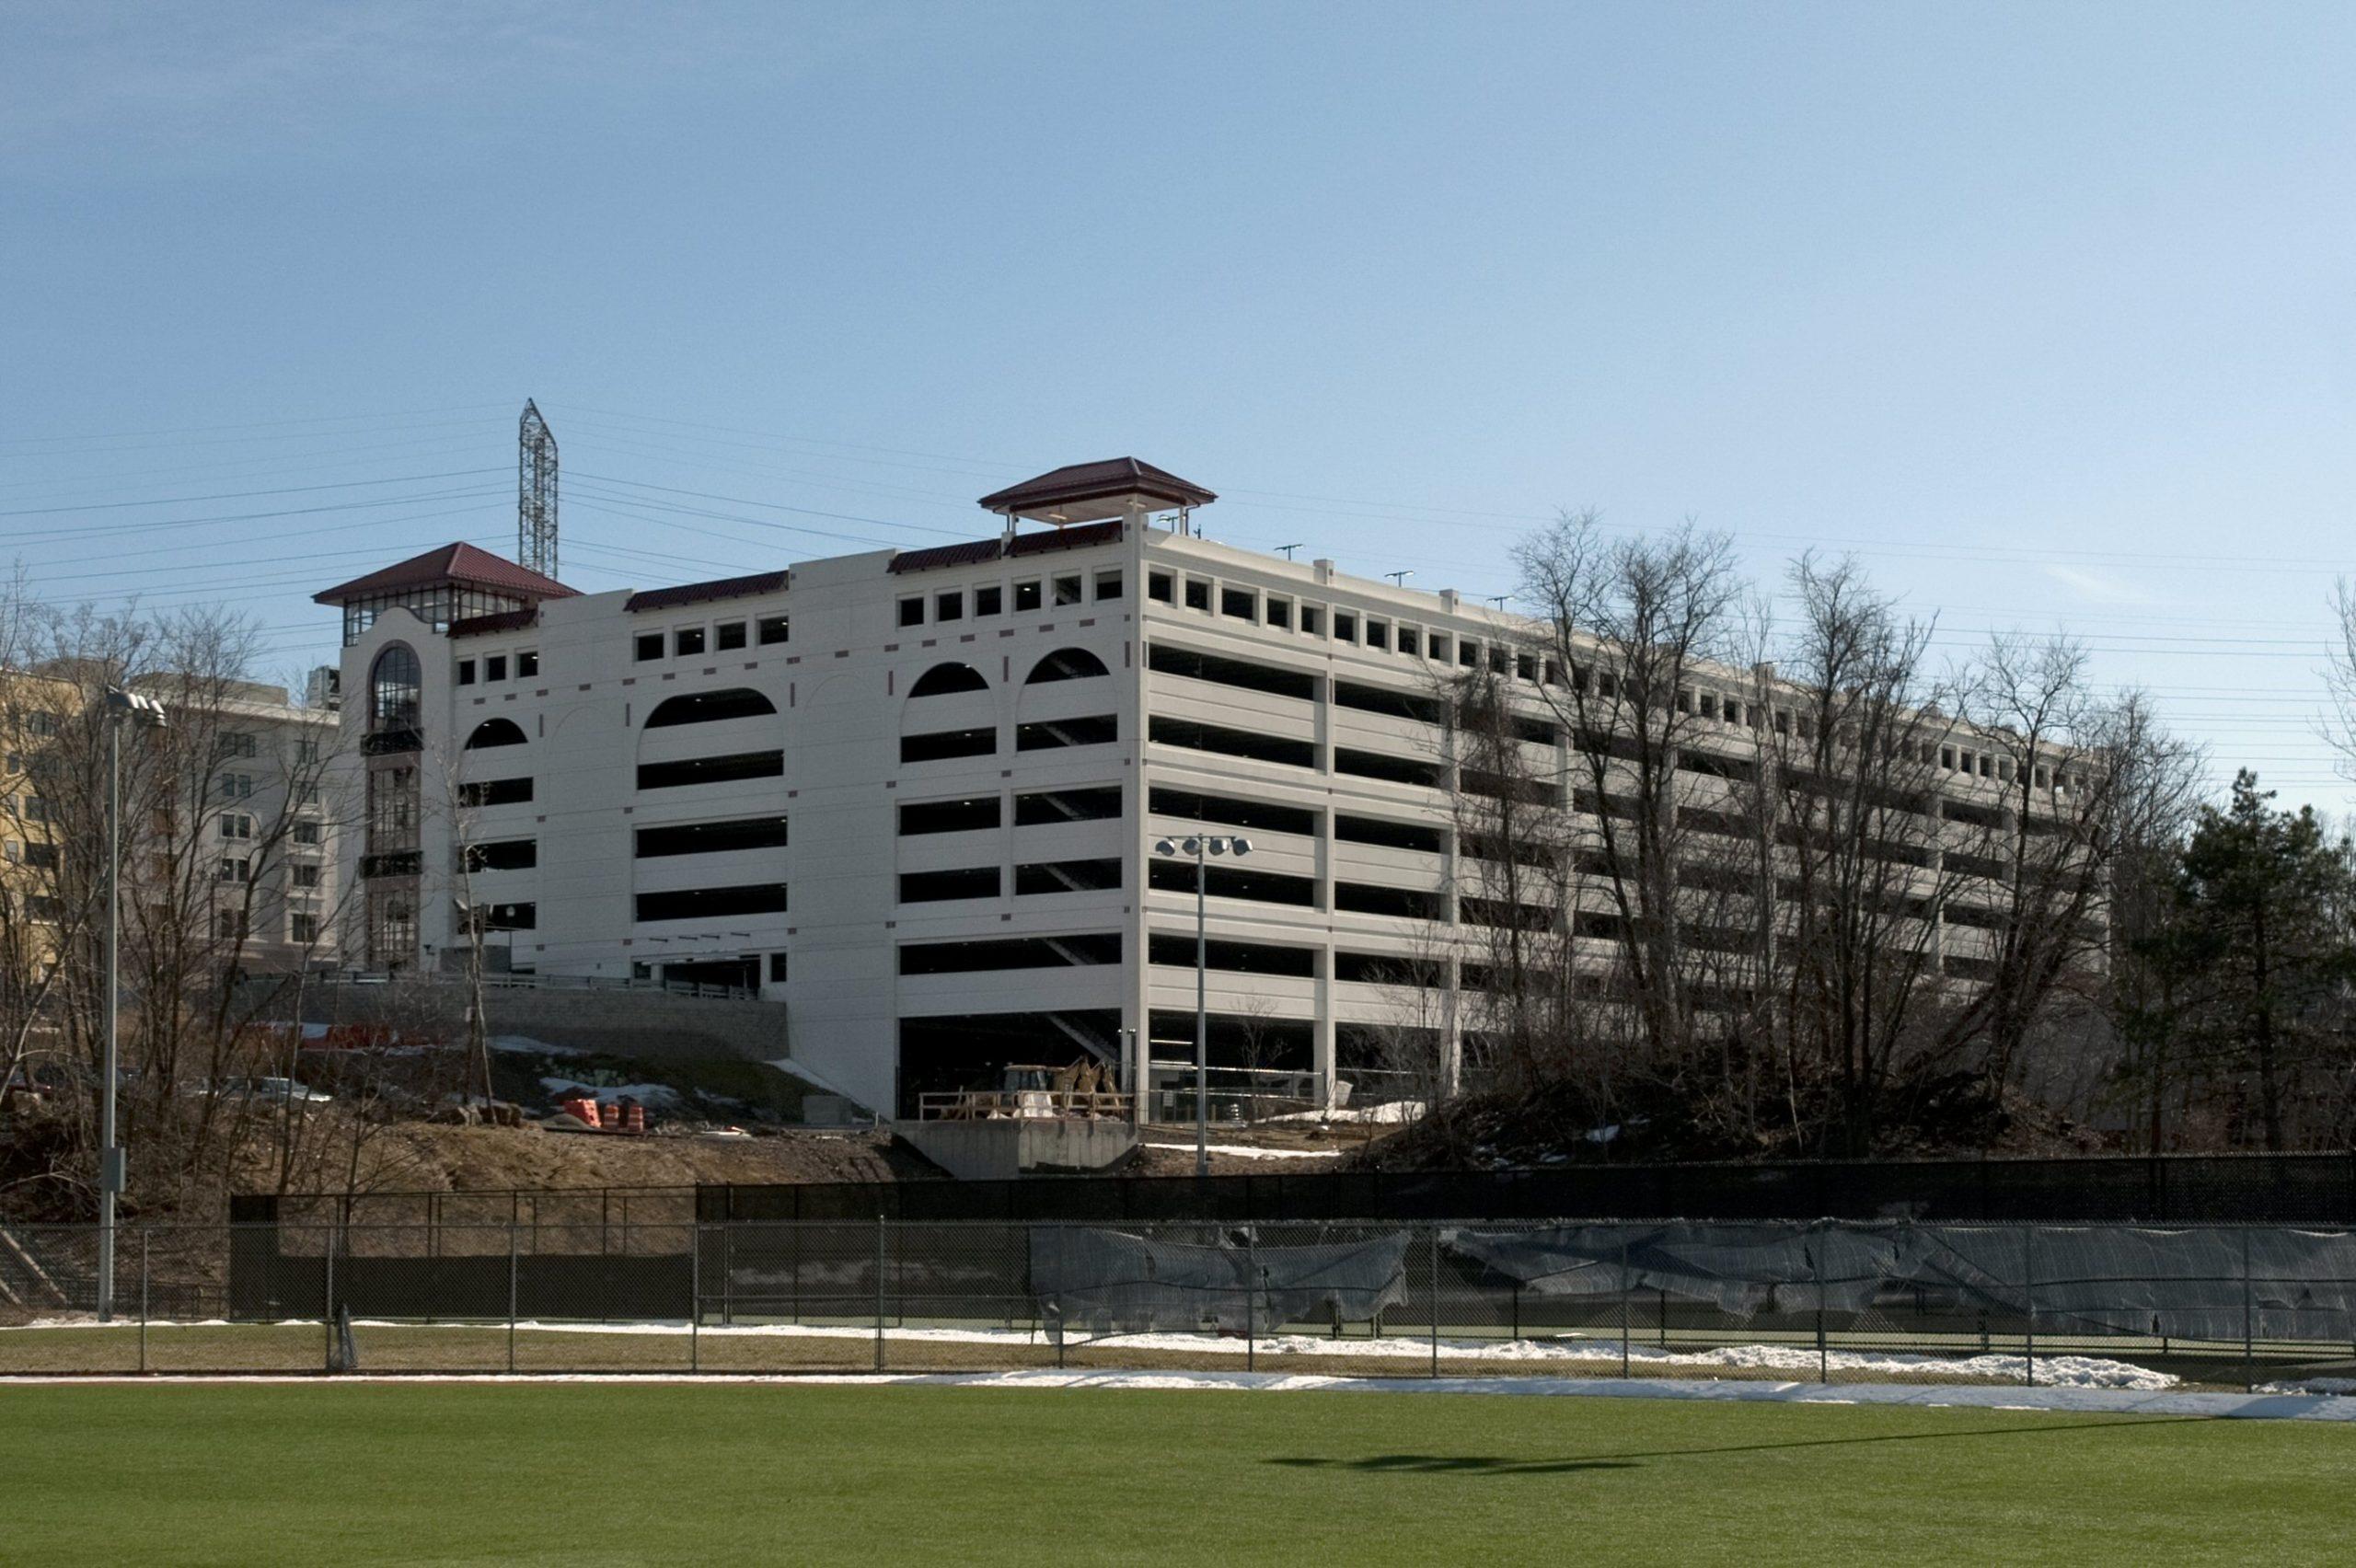 Montclair State University parking garage